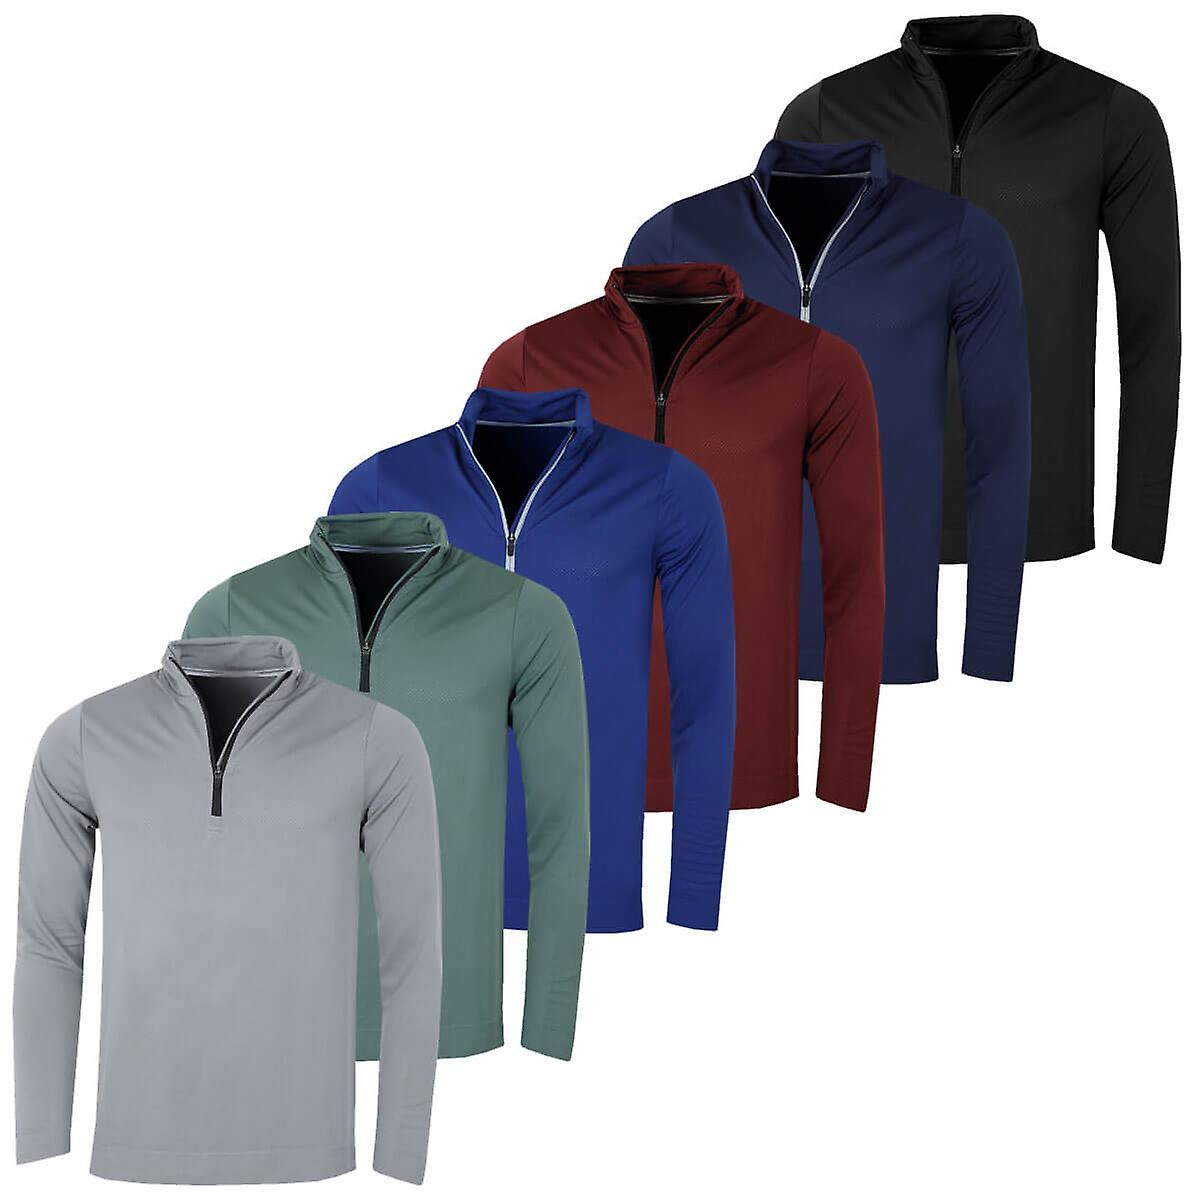 f6e77e73f Puma Golf Mens Essential Evoknit 1/4 Zip Sweater